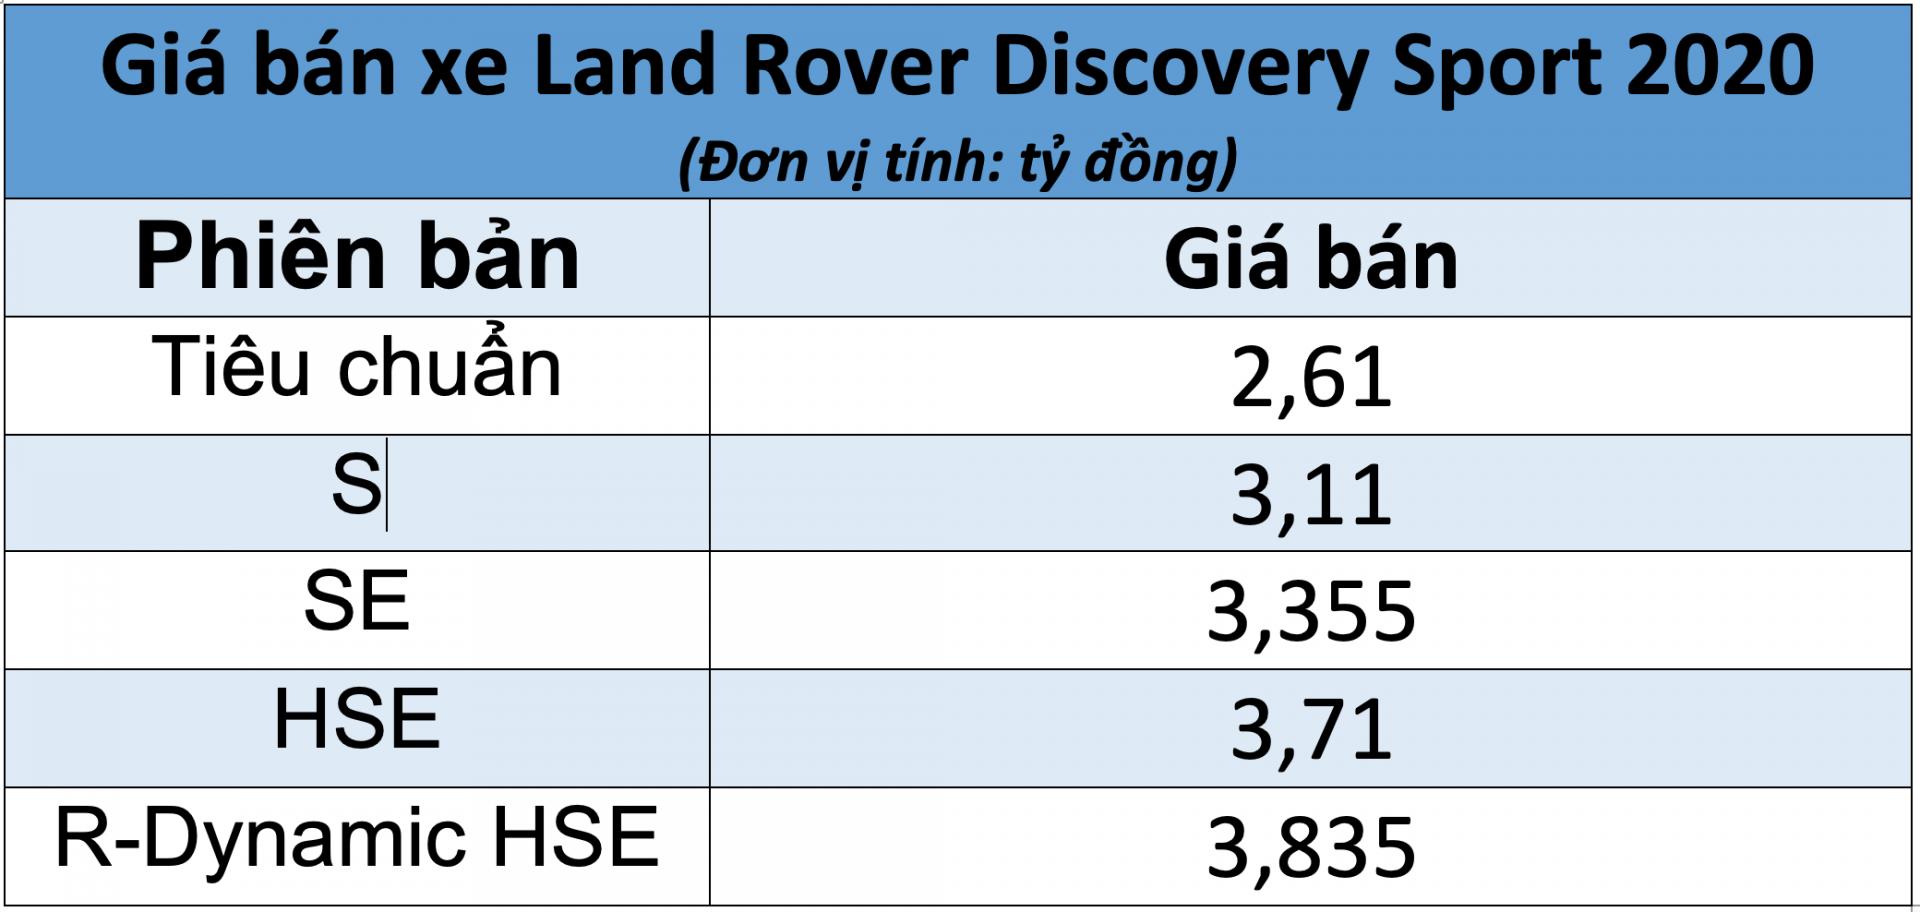 Giá bán xe Land Rover Discovery Sport 2020